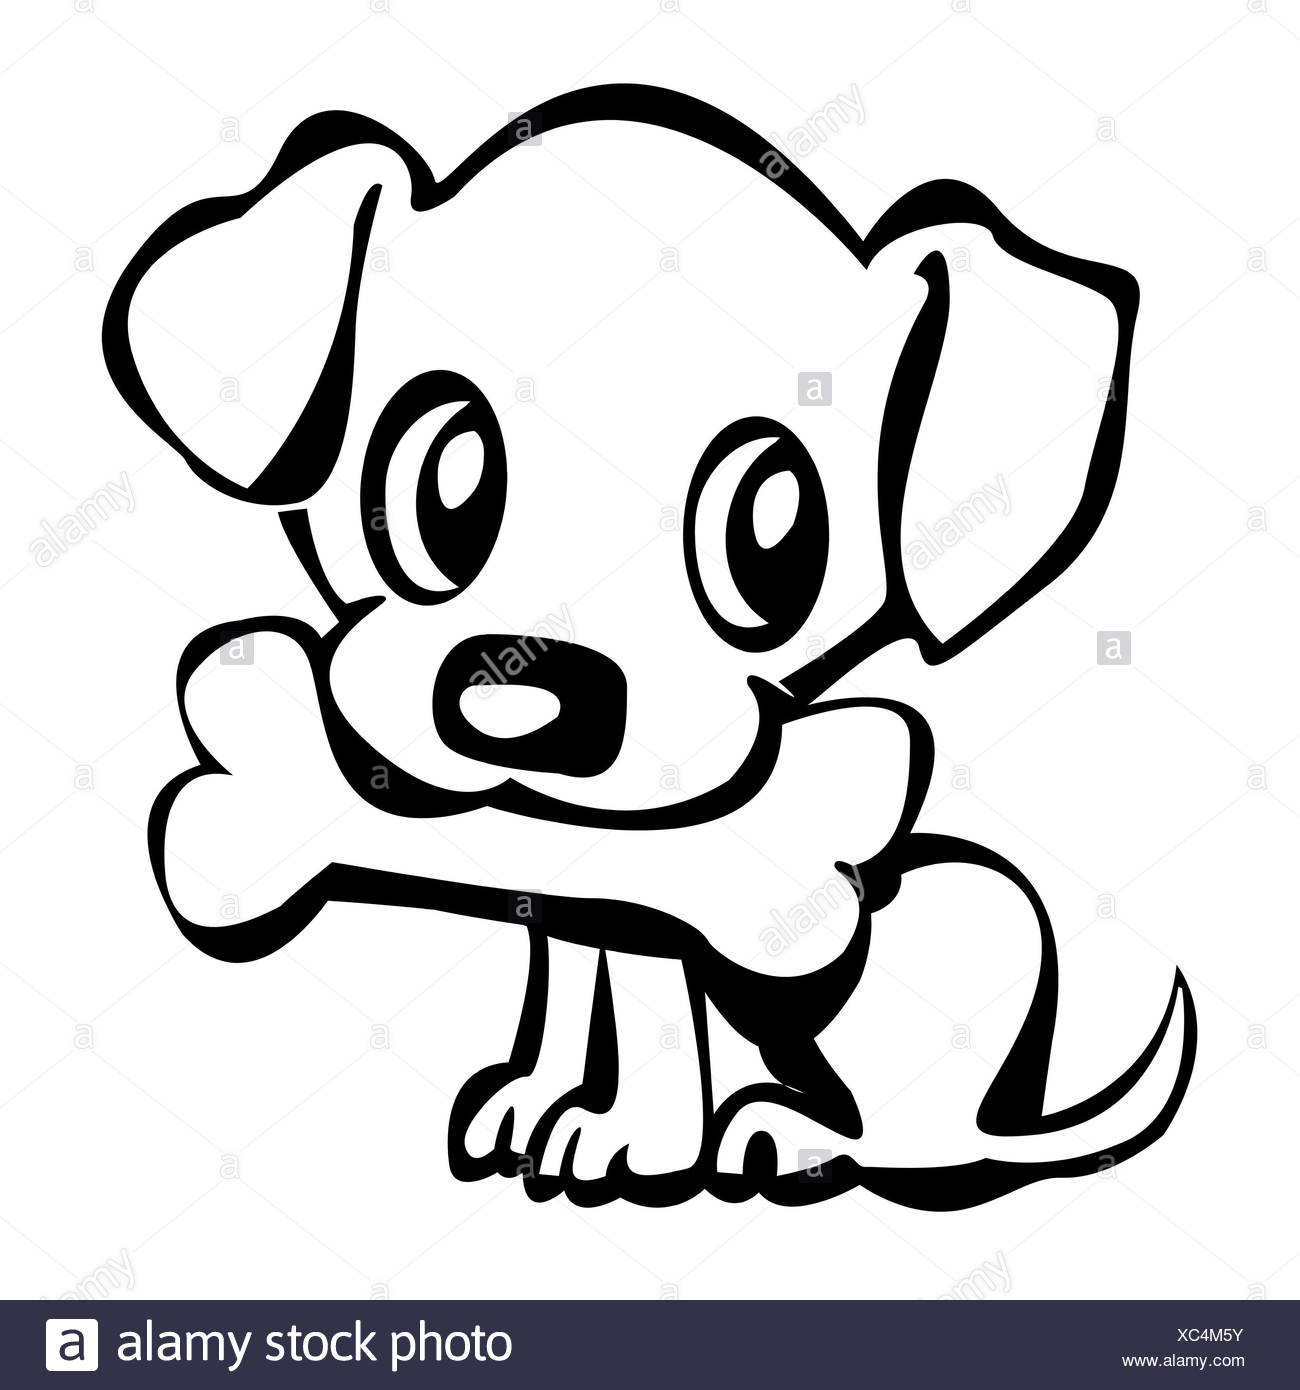 Food Aliment Art Dog Bone Bark Cartoon Maddening Pert Coquettish Cute Food Stock Photo Alamy